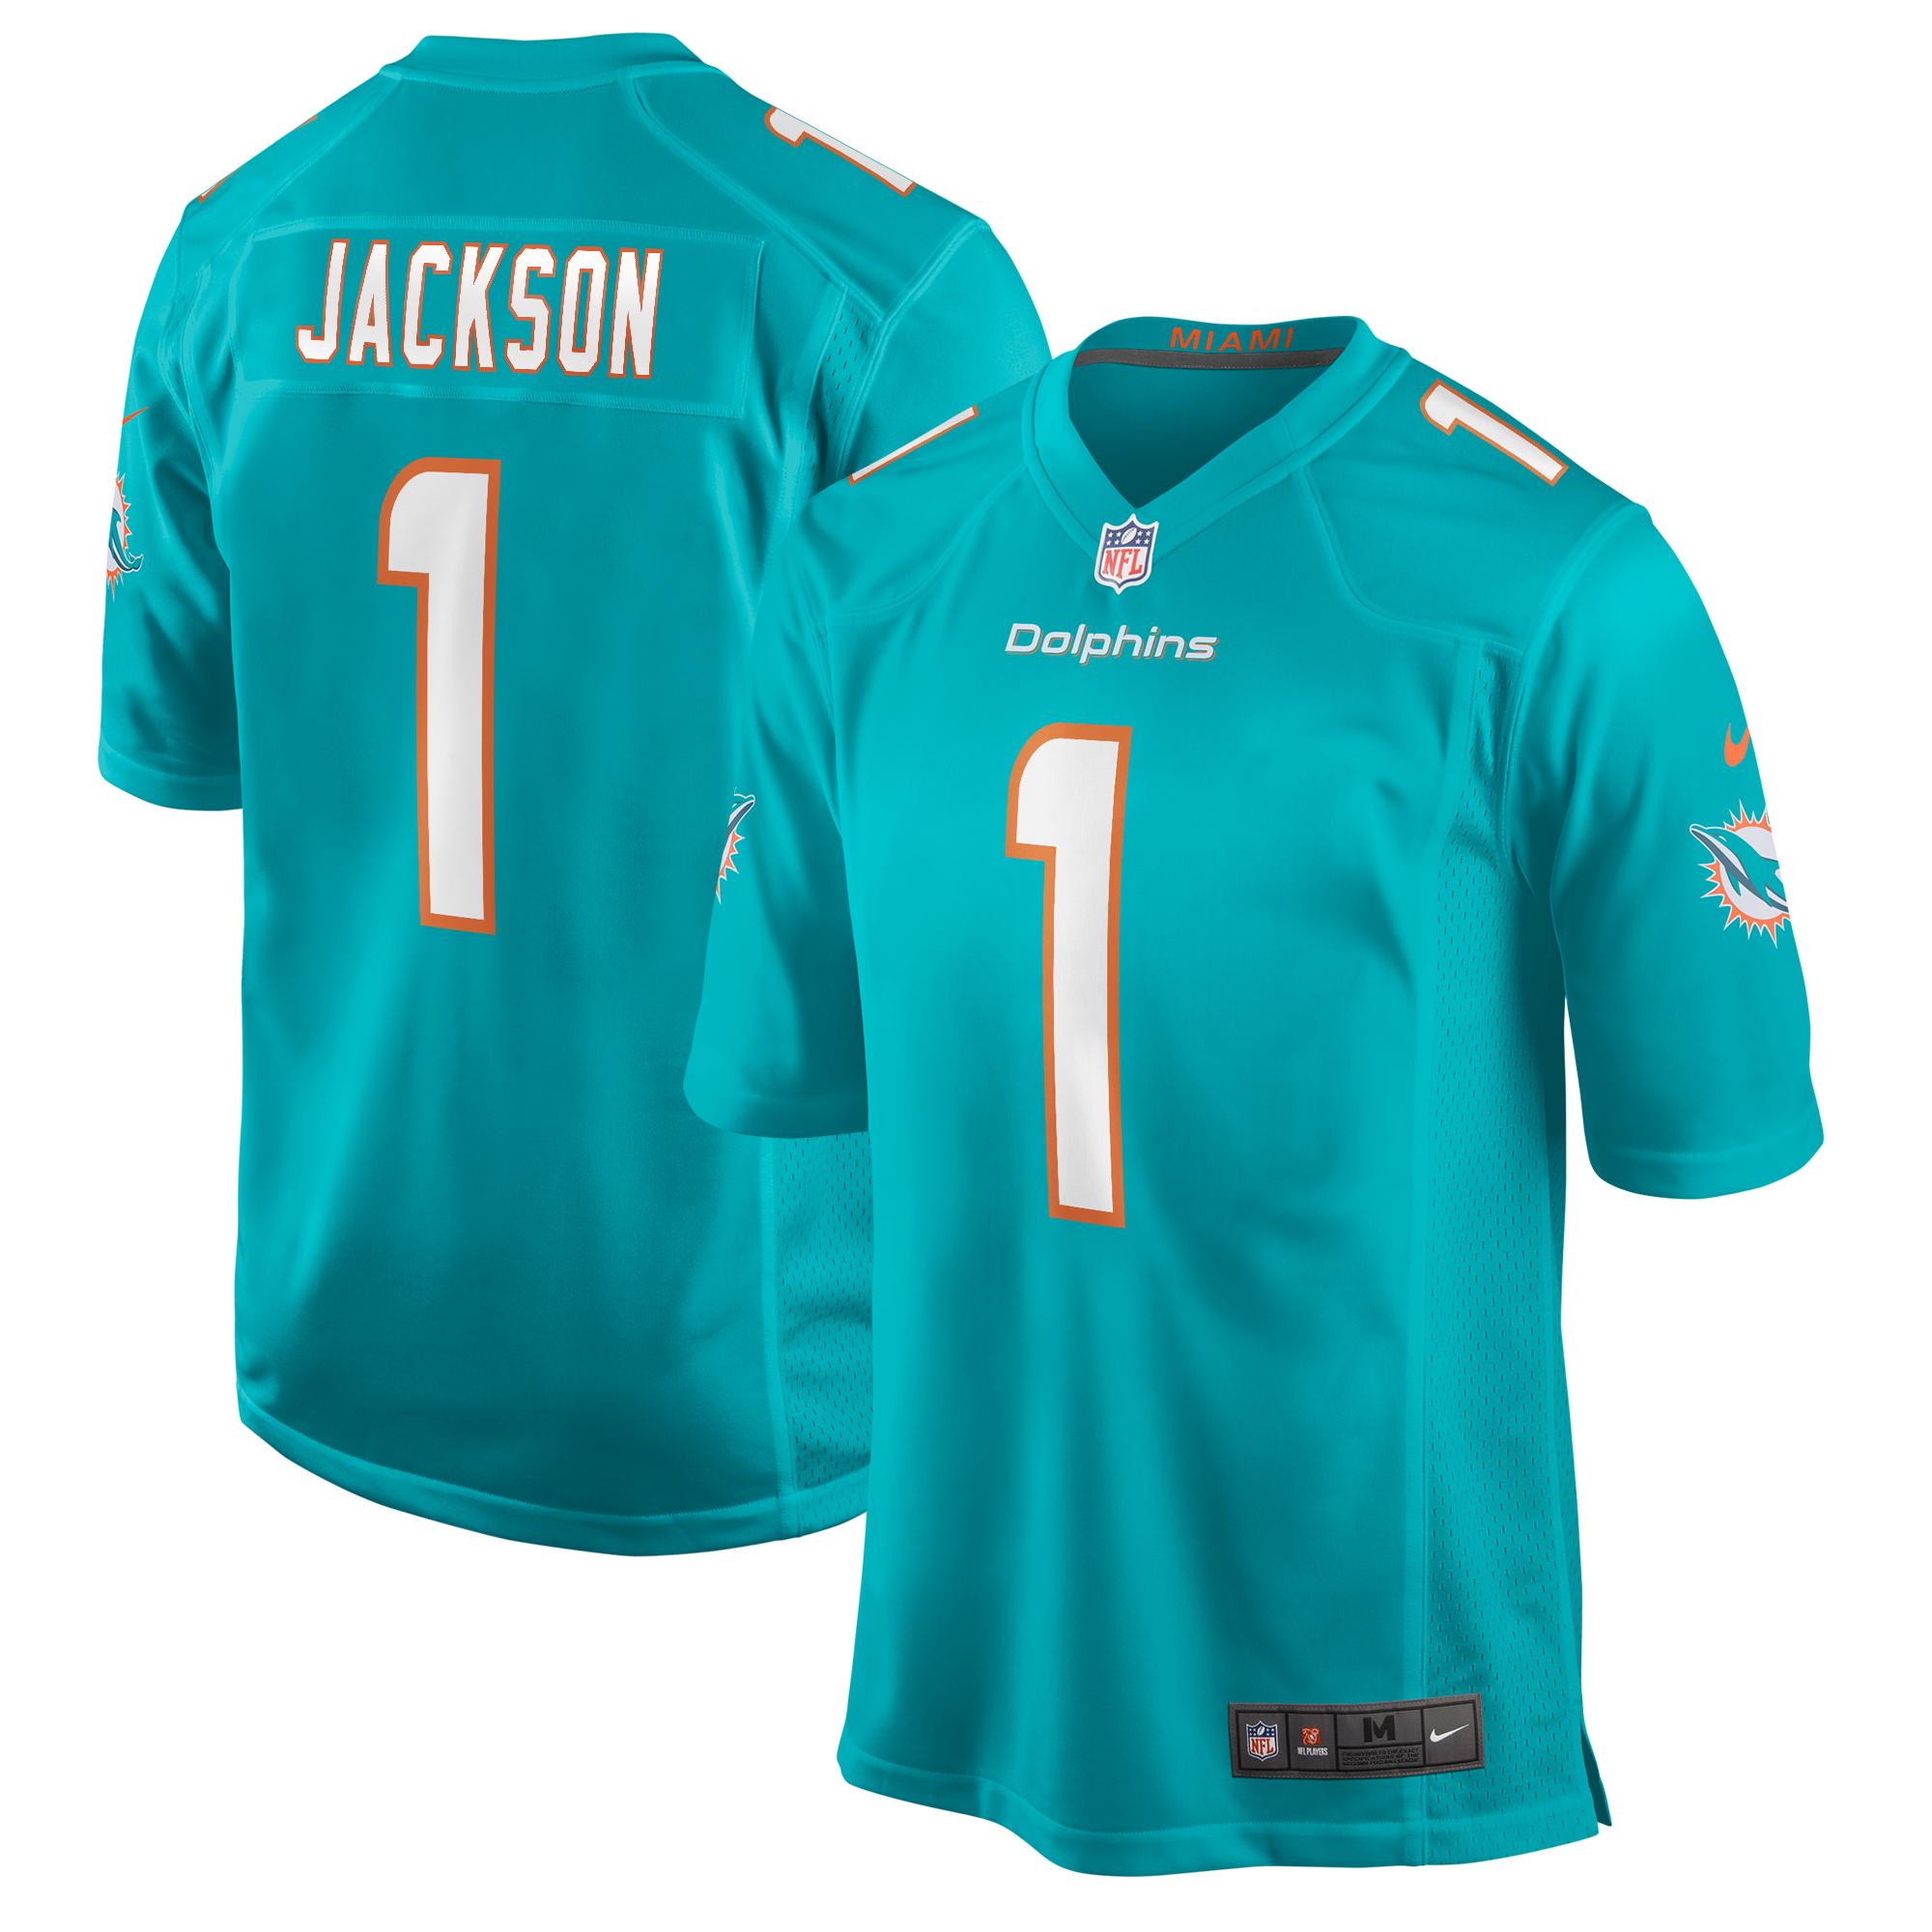 Austin Jackson Miami Dolphins Nike 2020 NFL Draft First Round Pick Game Jersey - Aqua